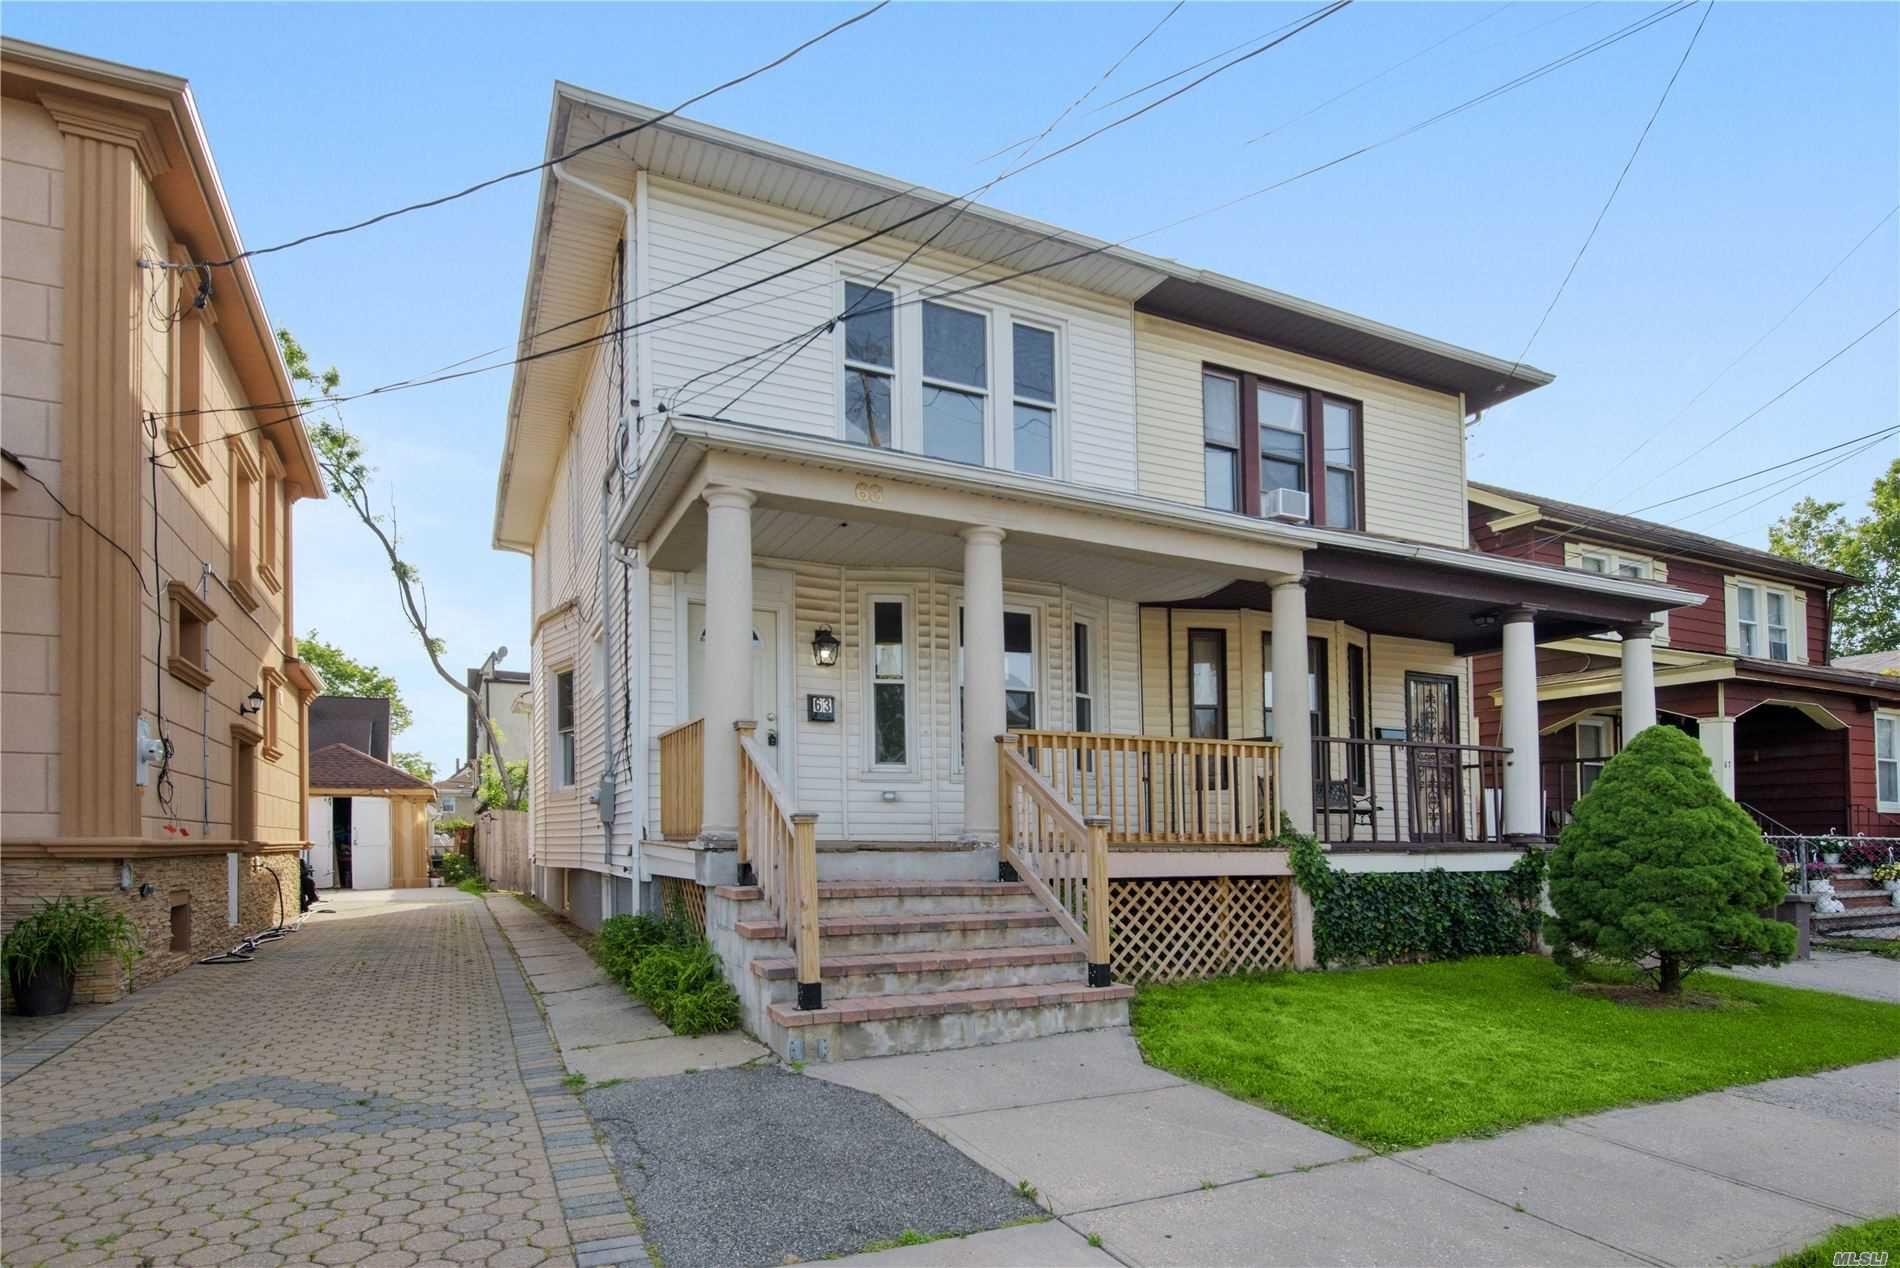 63 Ormond Street, Hempstead, NY 11550 - MLS#: 3230021